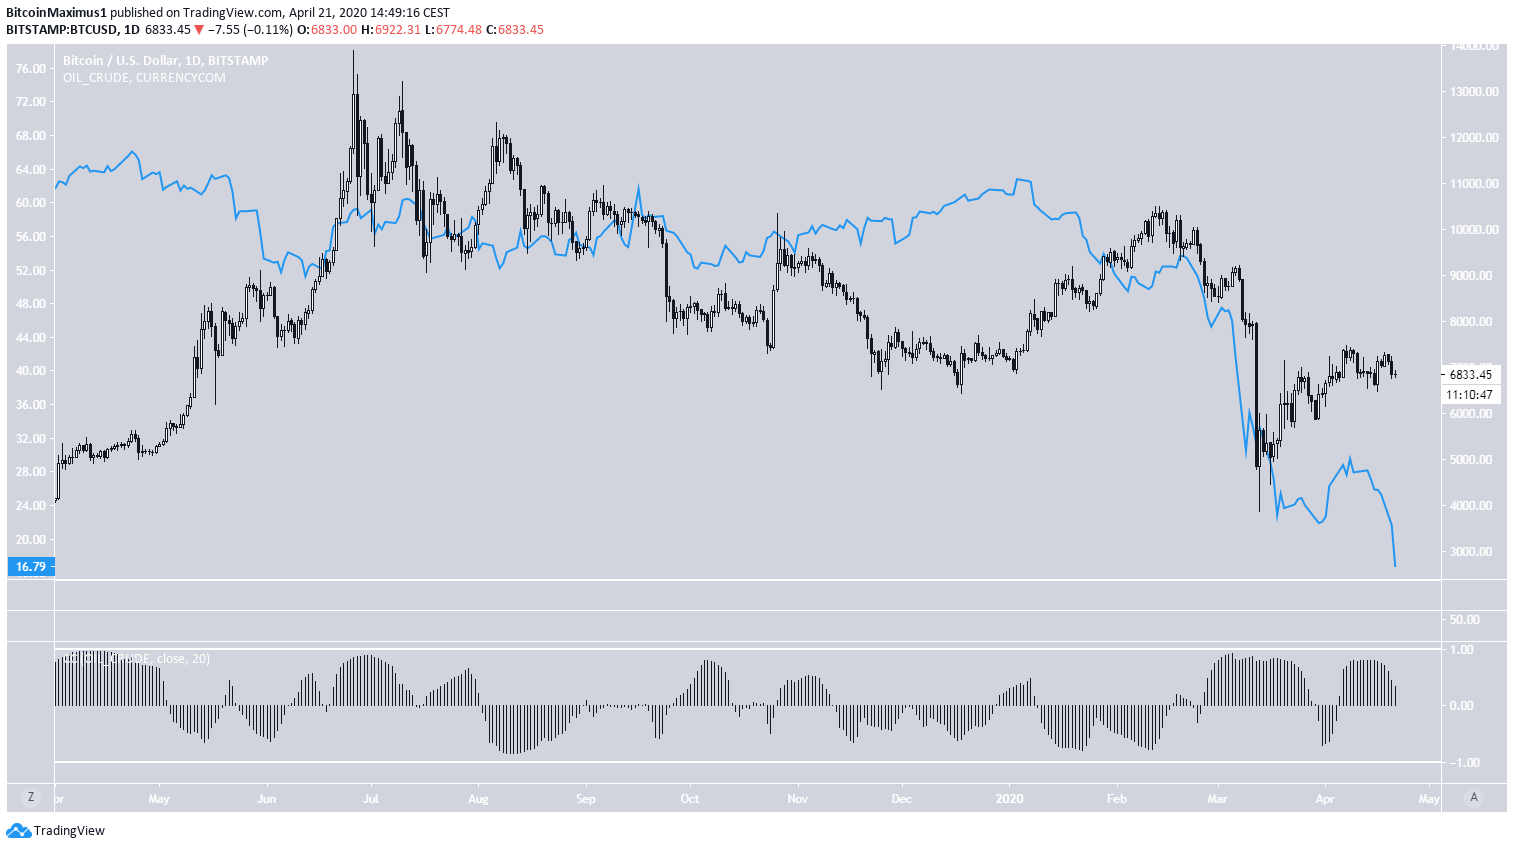 BTC OIL Correlation